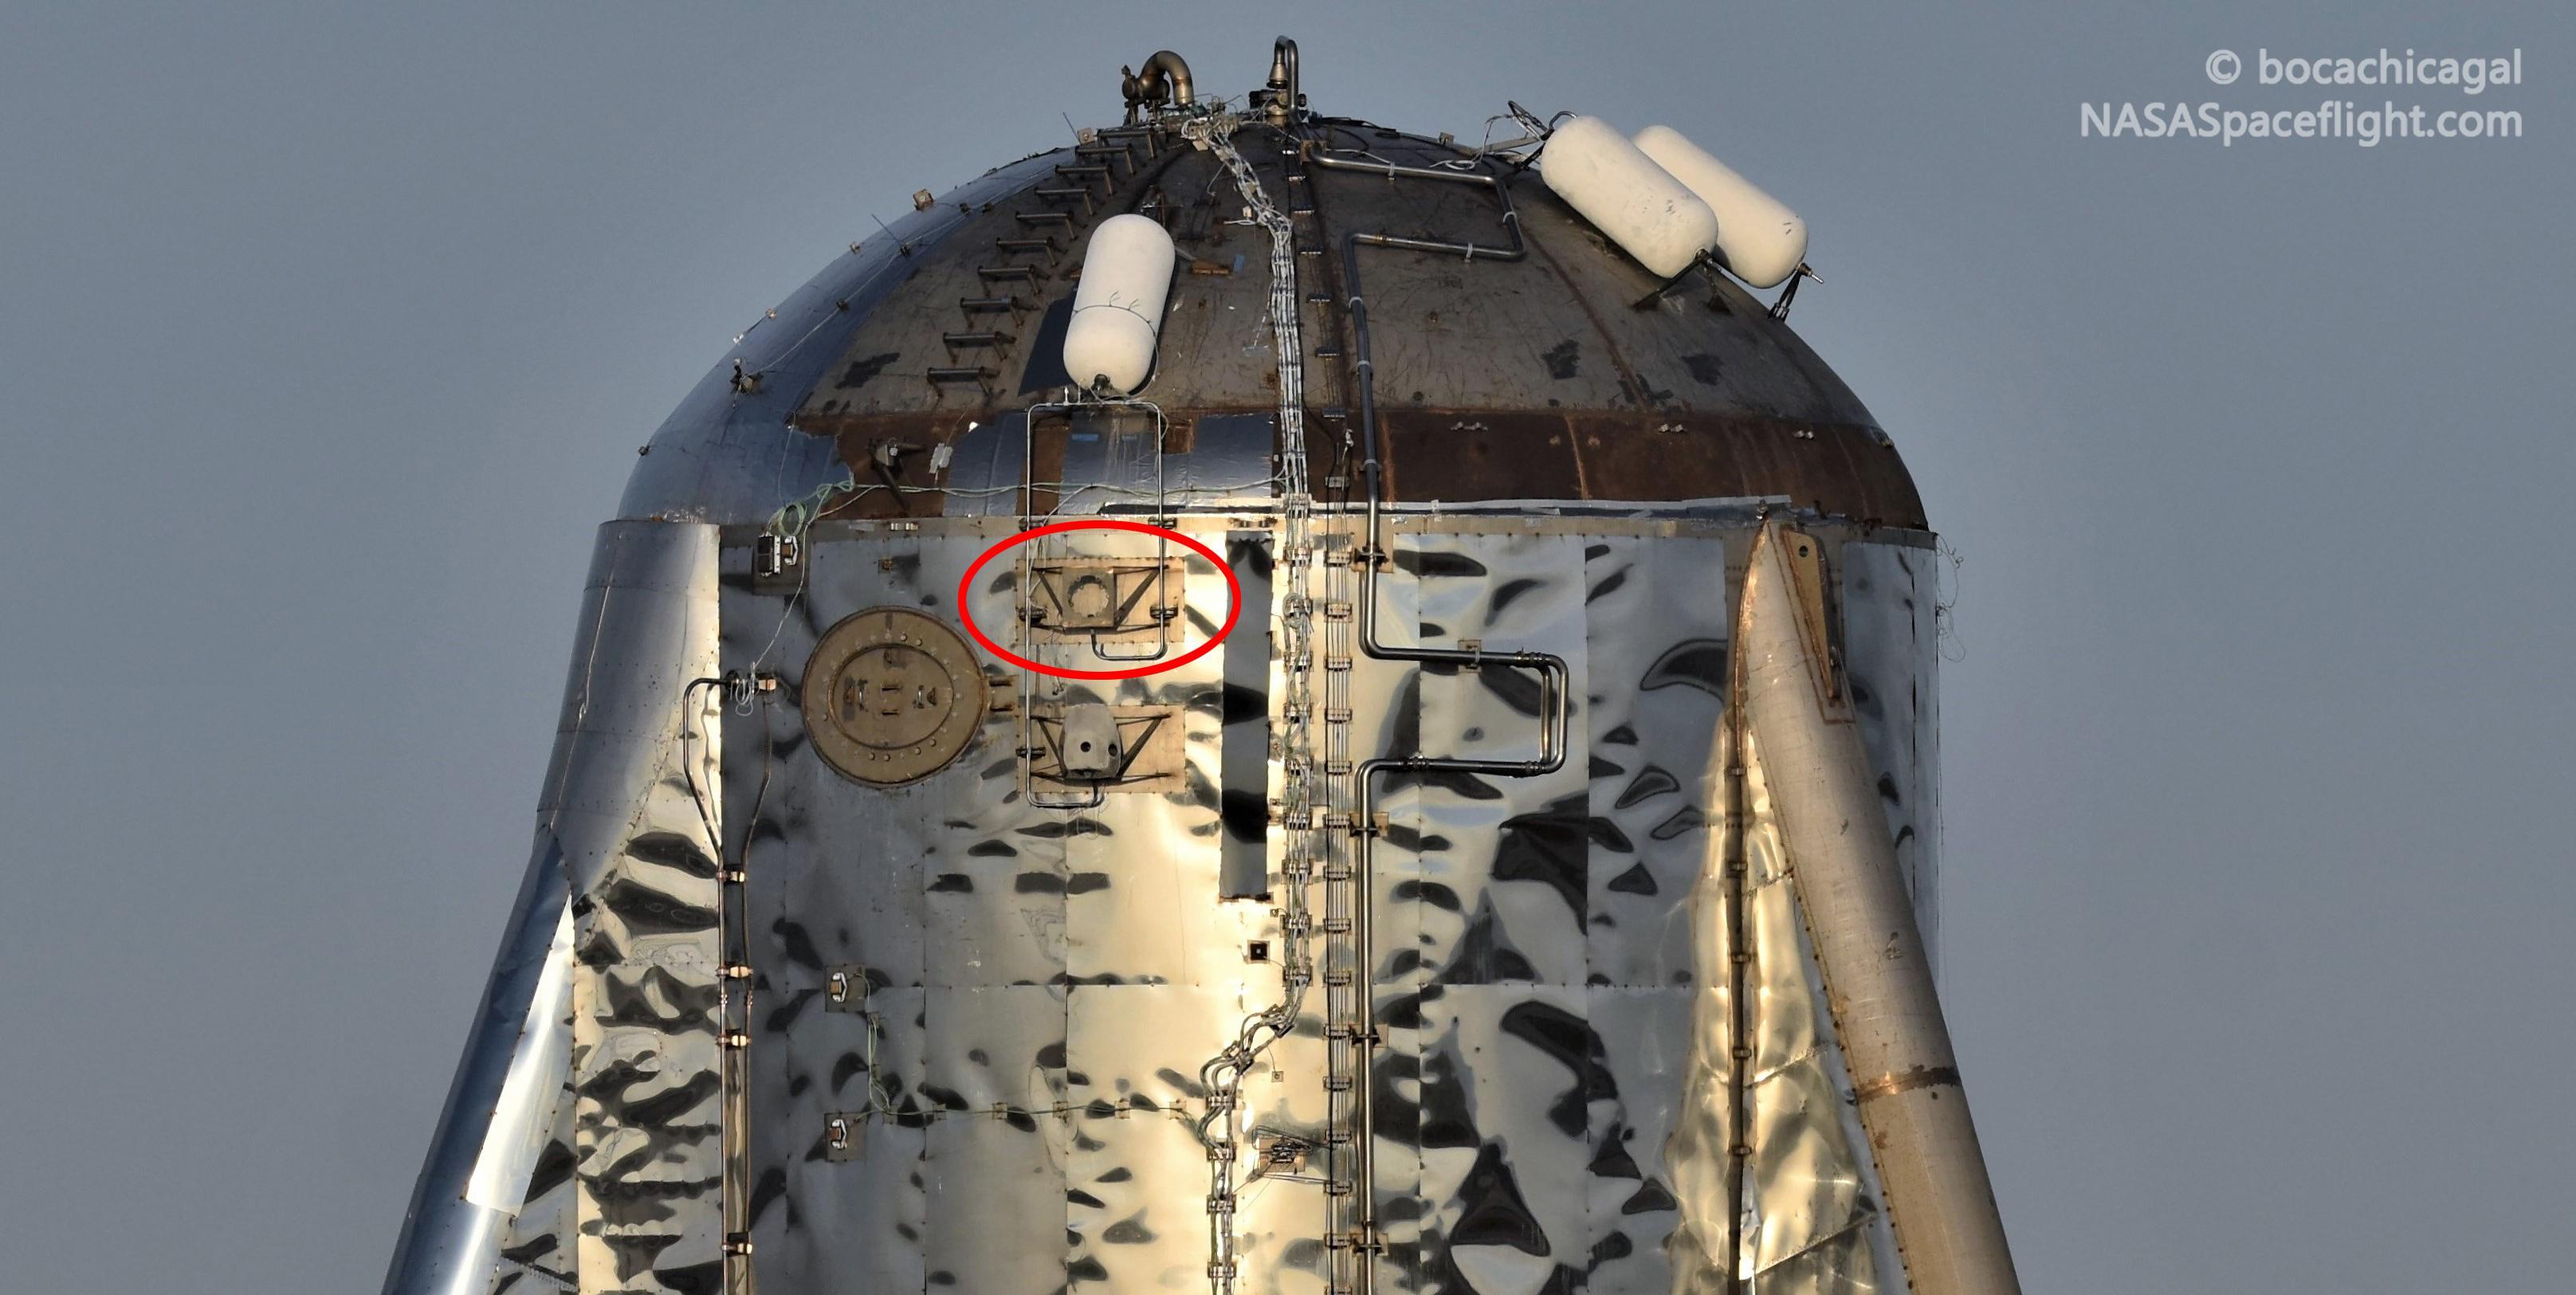 Boca Chica Starship Mk1 110519 (NASASpaceflight – bocachicagal) pad 5 crop circle